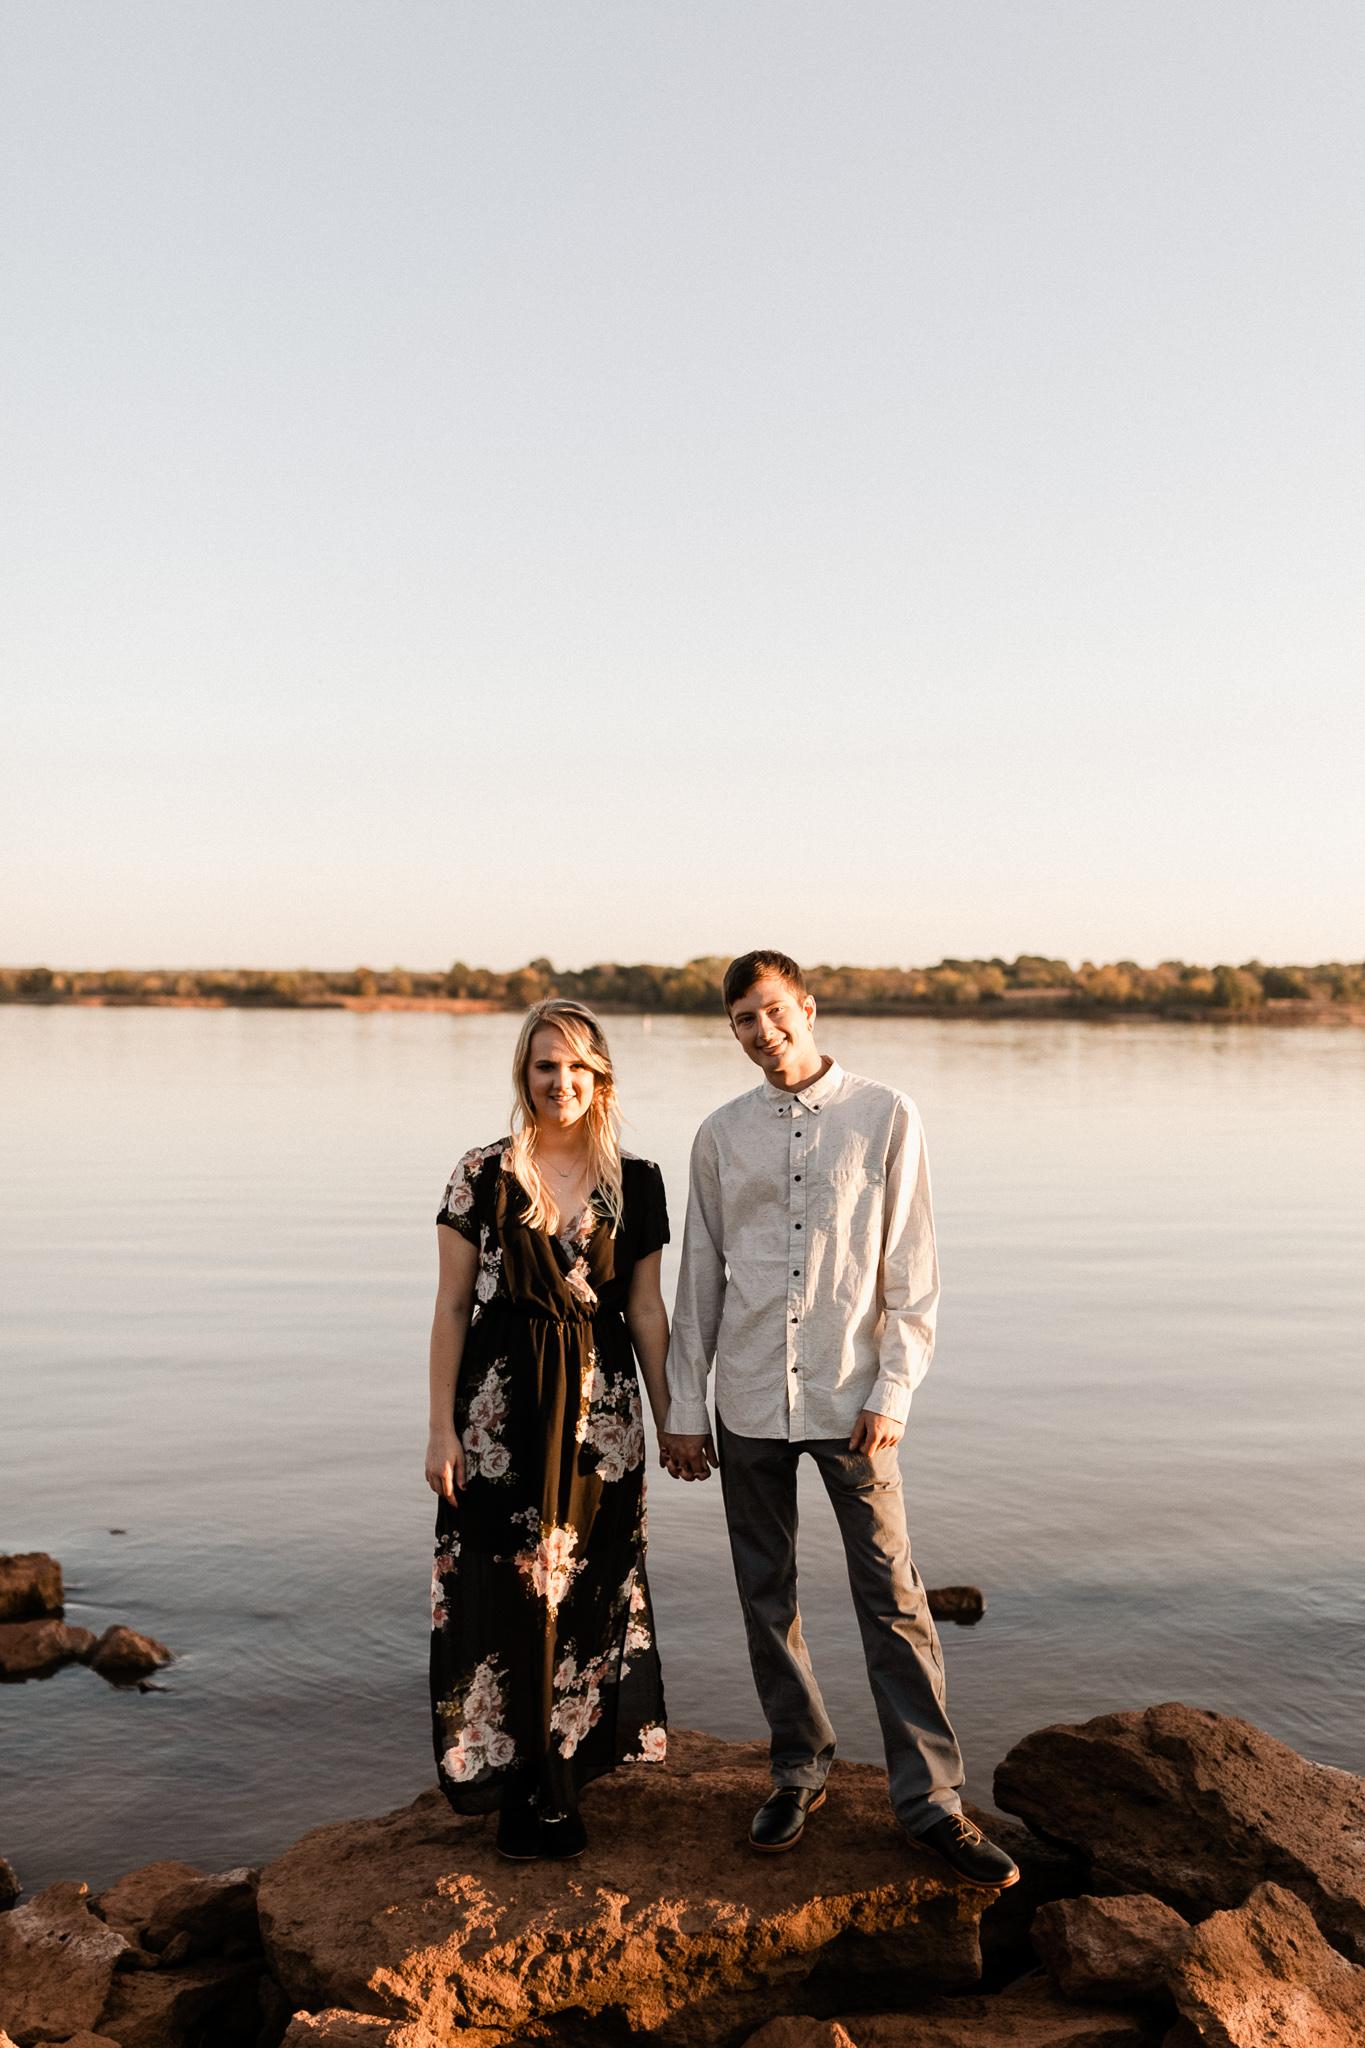 Kyle + Brittany | Fall Lake Engagement Photos | Oklahoma Lifestyle Photographer-32.jpg